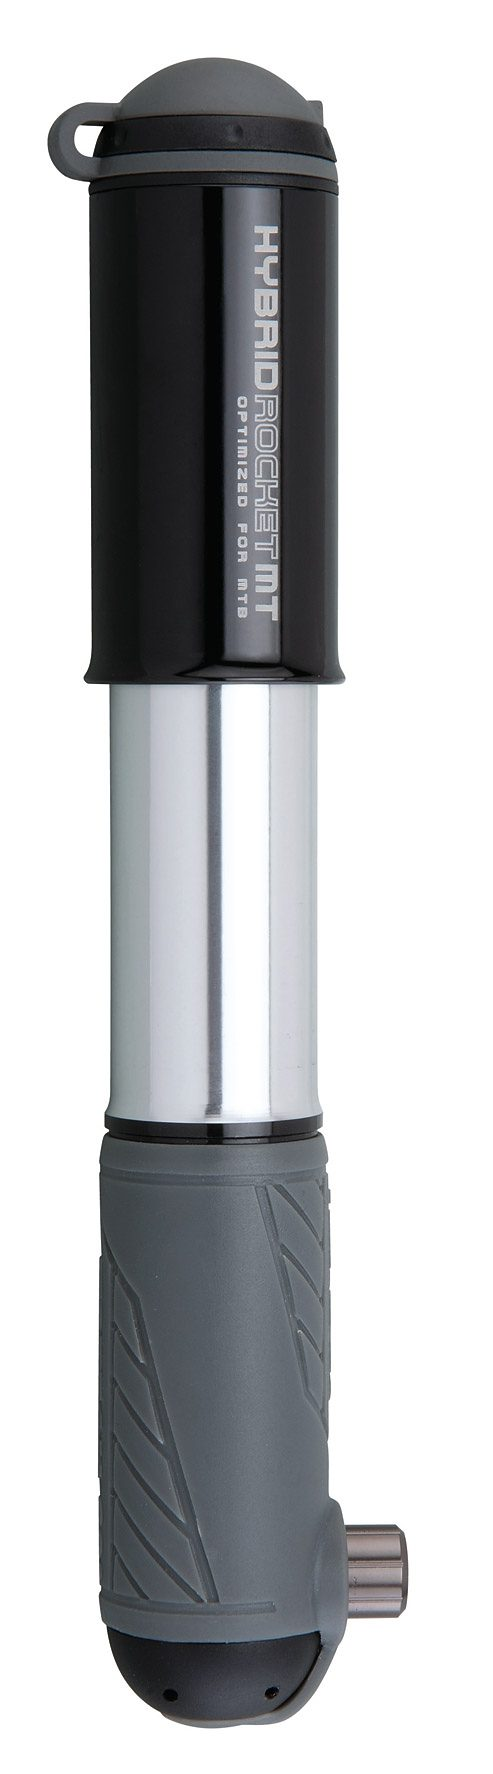 Topeak Fahrradpumpe »Hybrid Rocket MT Minipumpe«